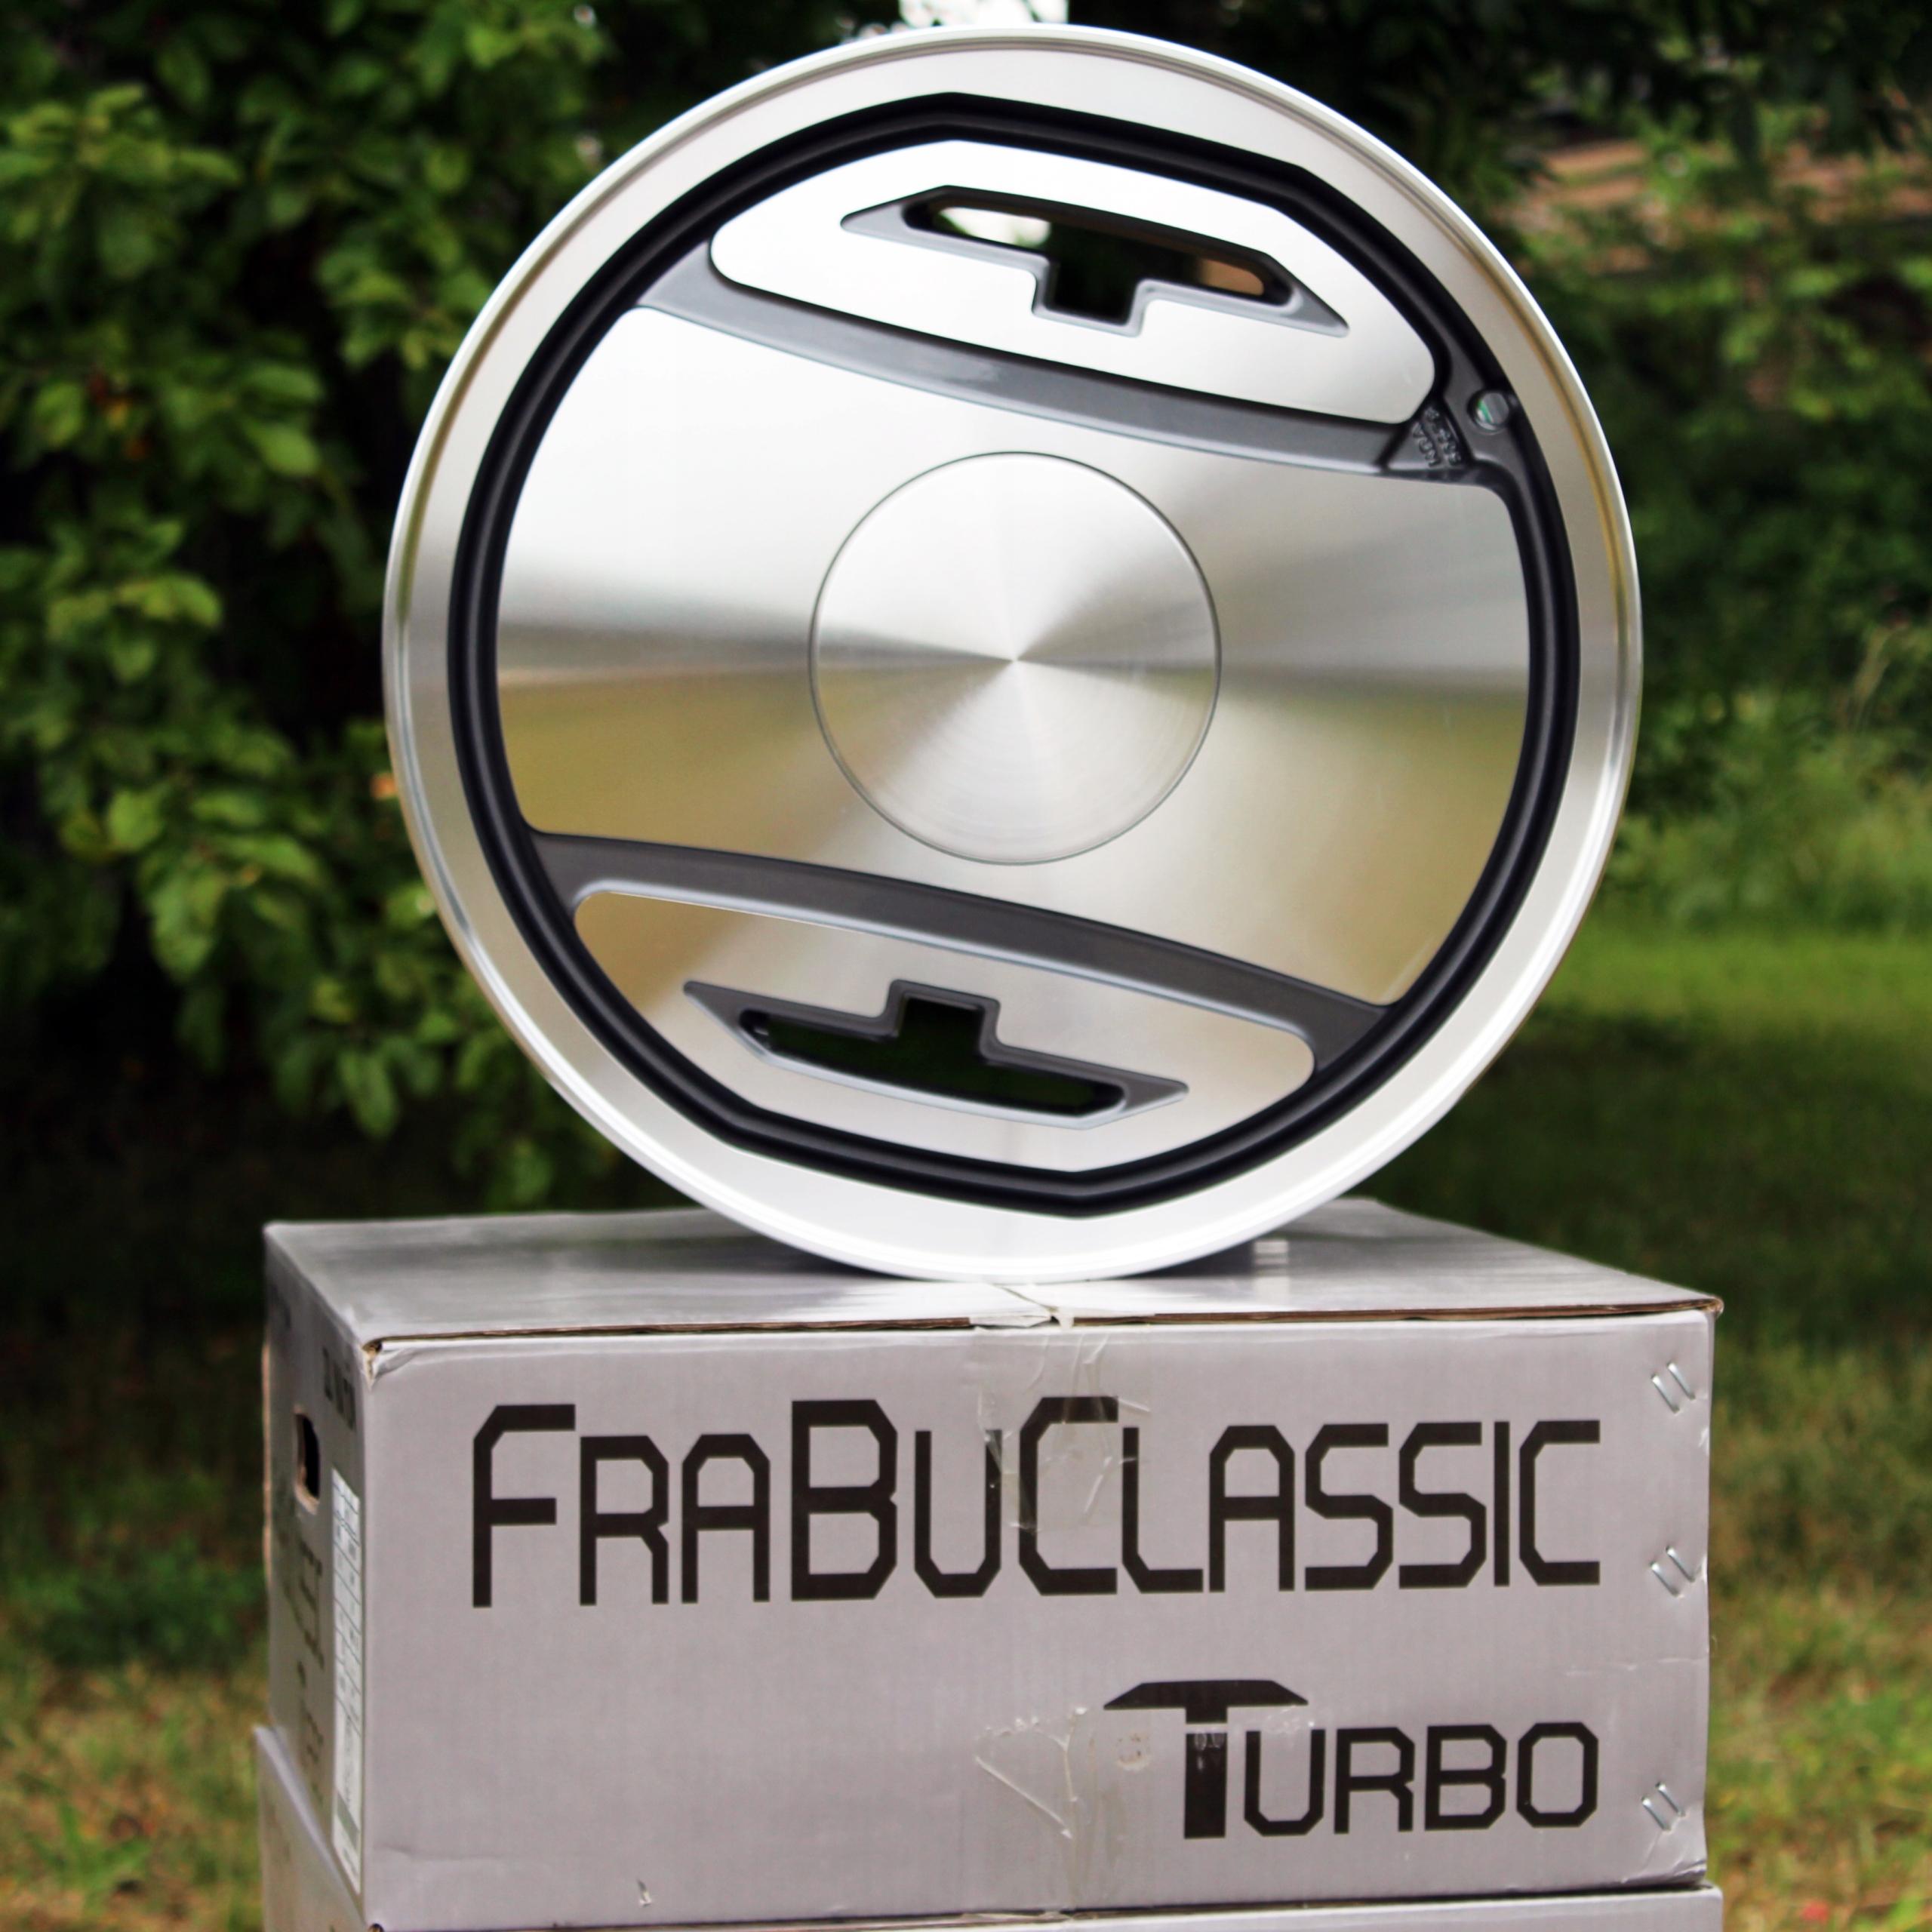 KOLESÁ 16 5x108 Citroen XM Turbo Frabuclassic